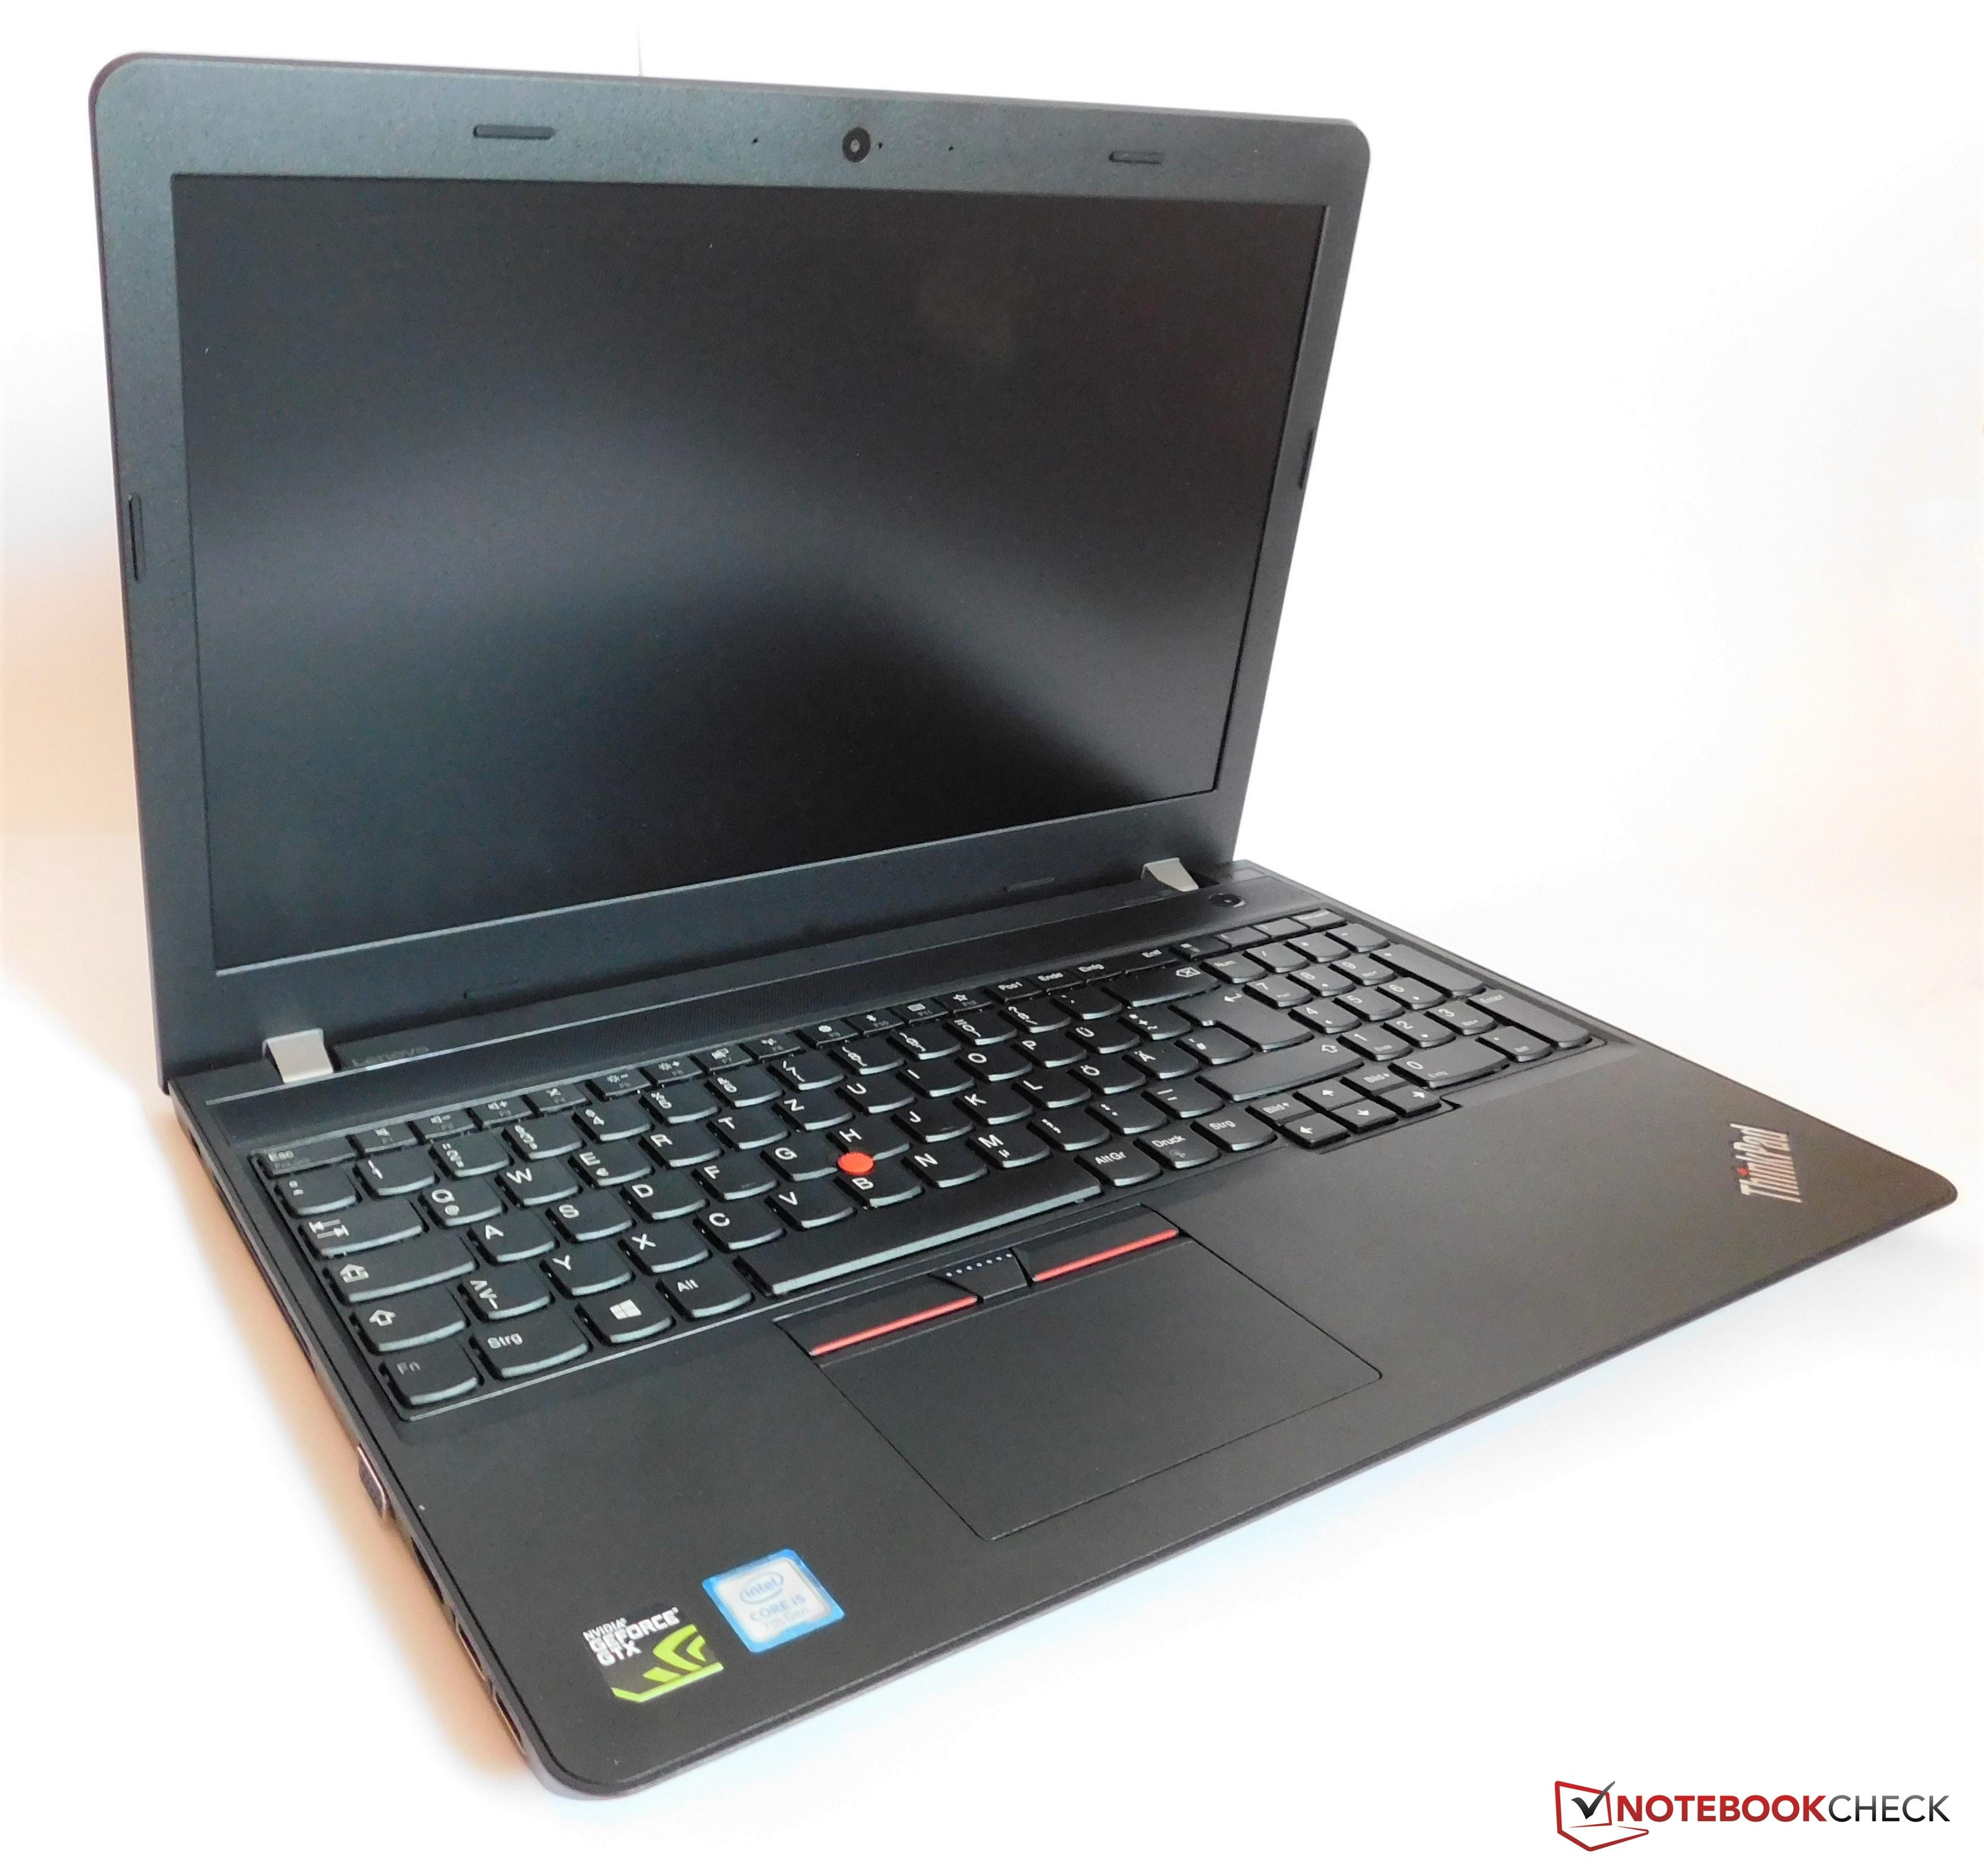 Lenovo ThinkPad E570 Core I5 GTX 950M Notebook Review